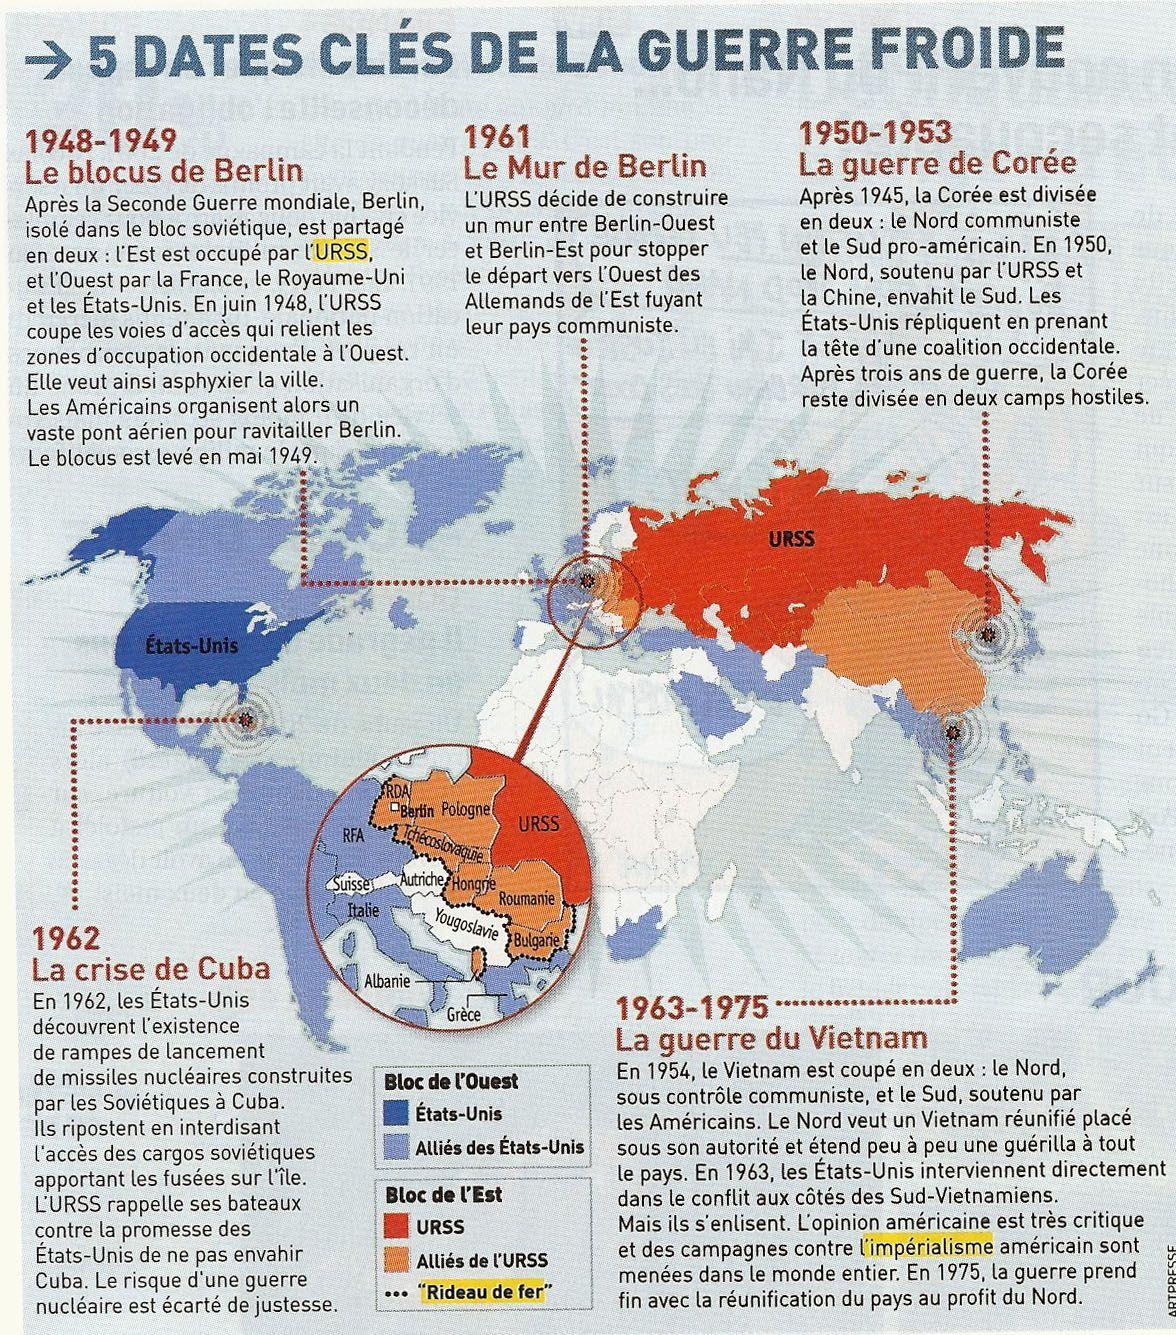 La Memoire Qui Flanche La Guerre Froide En 5 Dates Cles Guerre Froide Guerre De Coree Guerre